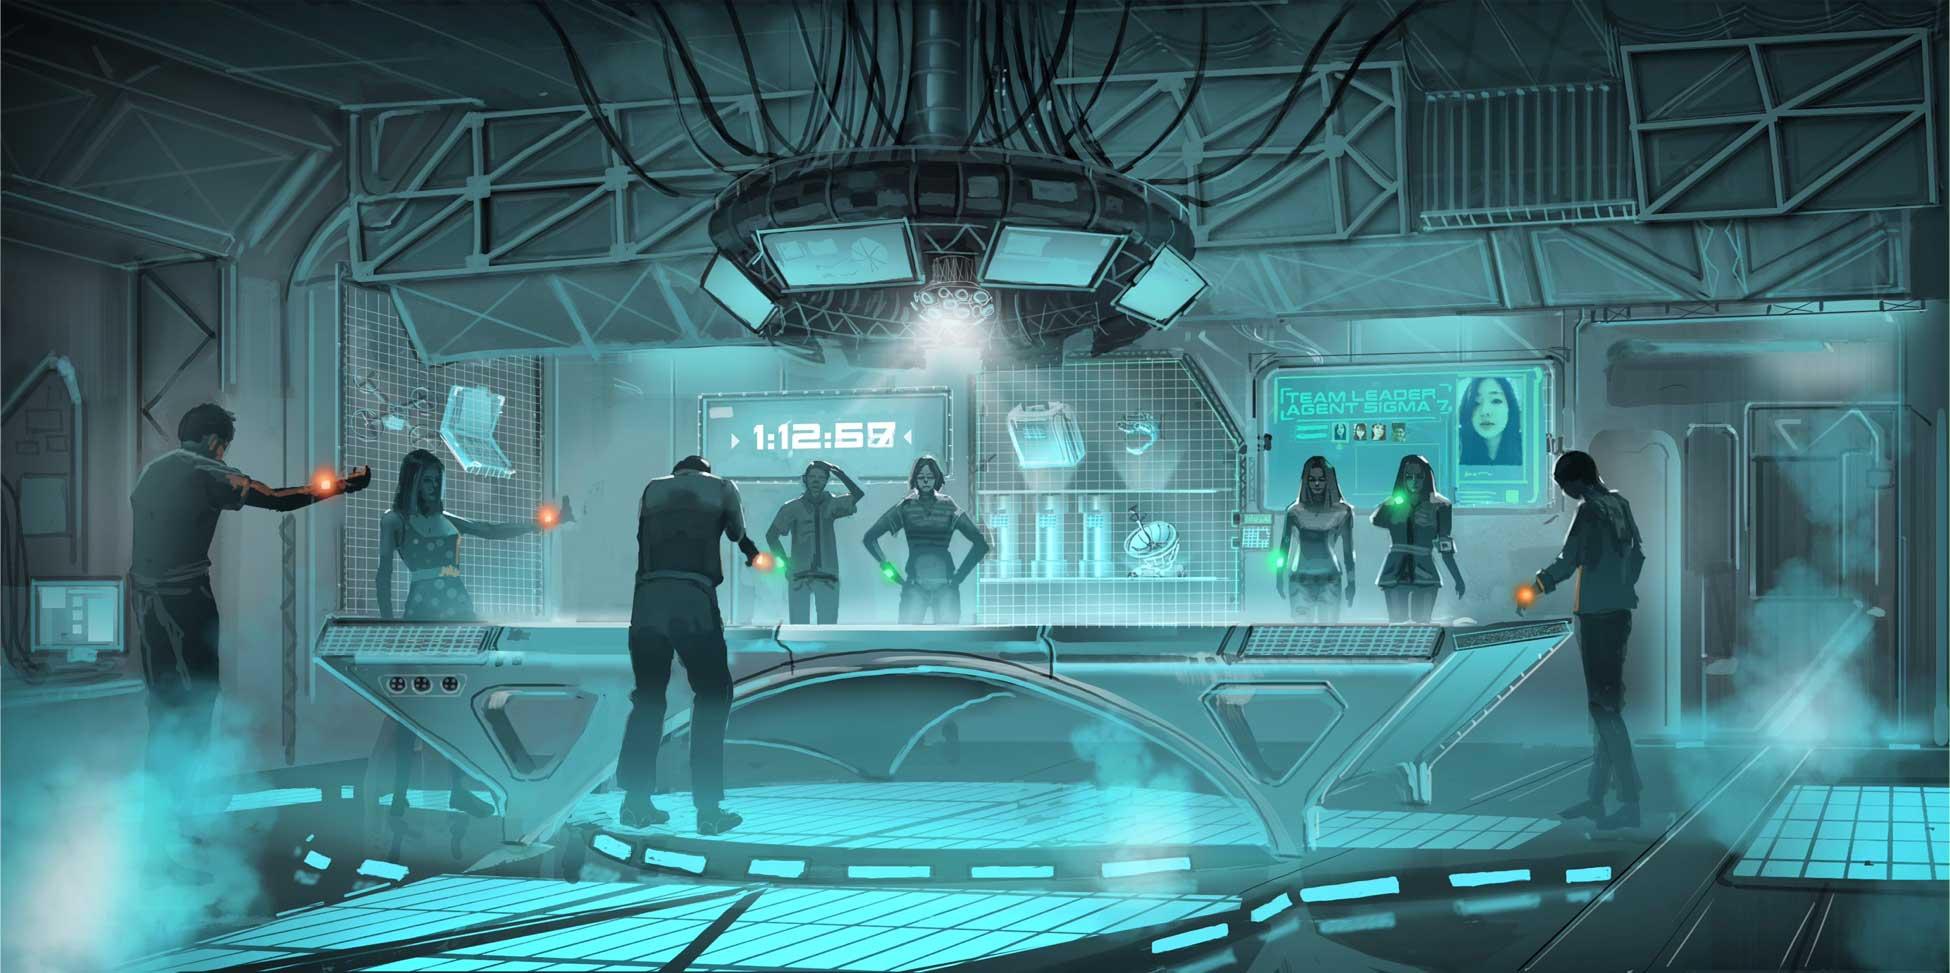 """The League of Spies"" Next-Gen Escape Room Attraction"